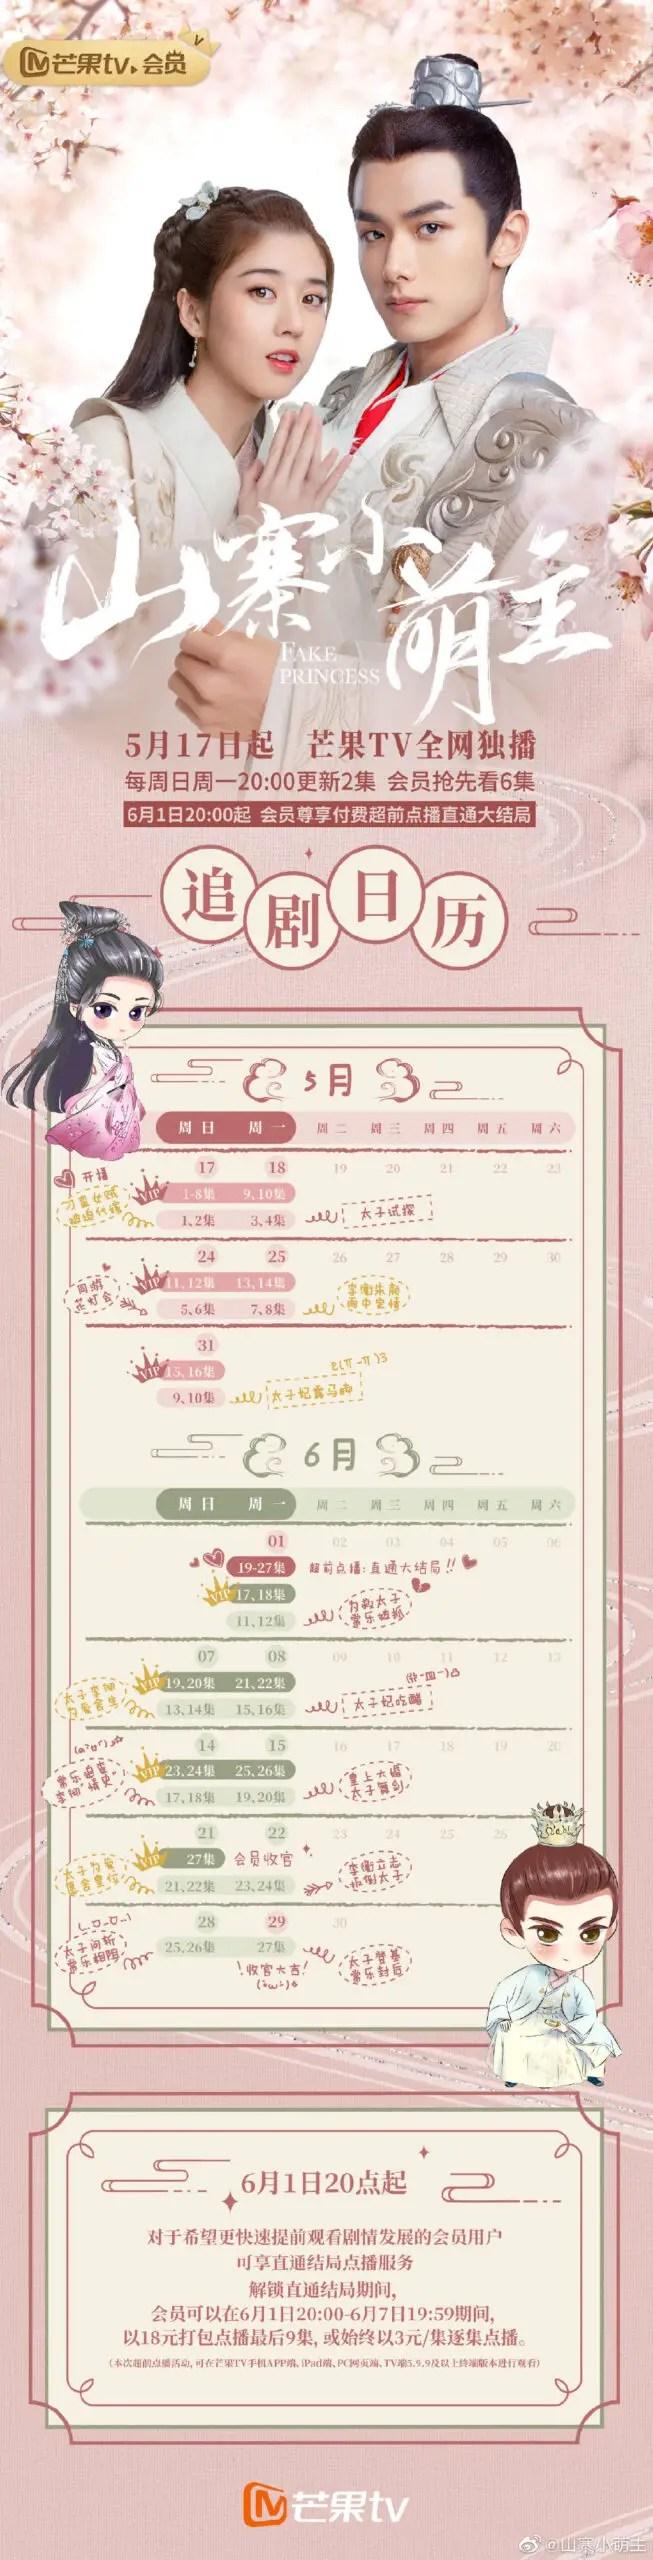 Fake Princess Airing Calendar